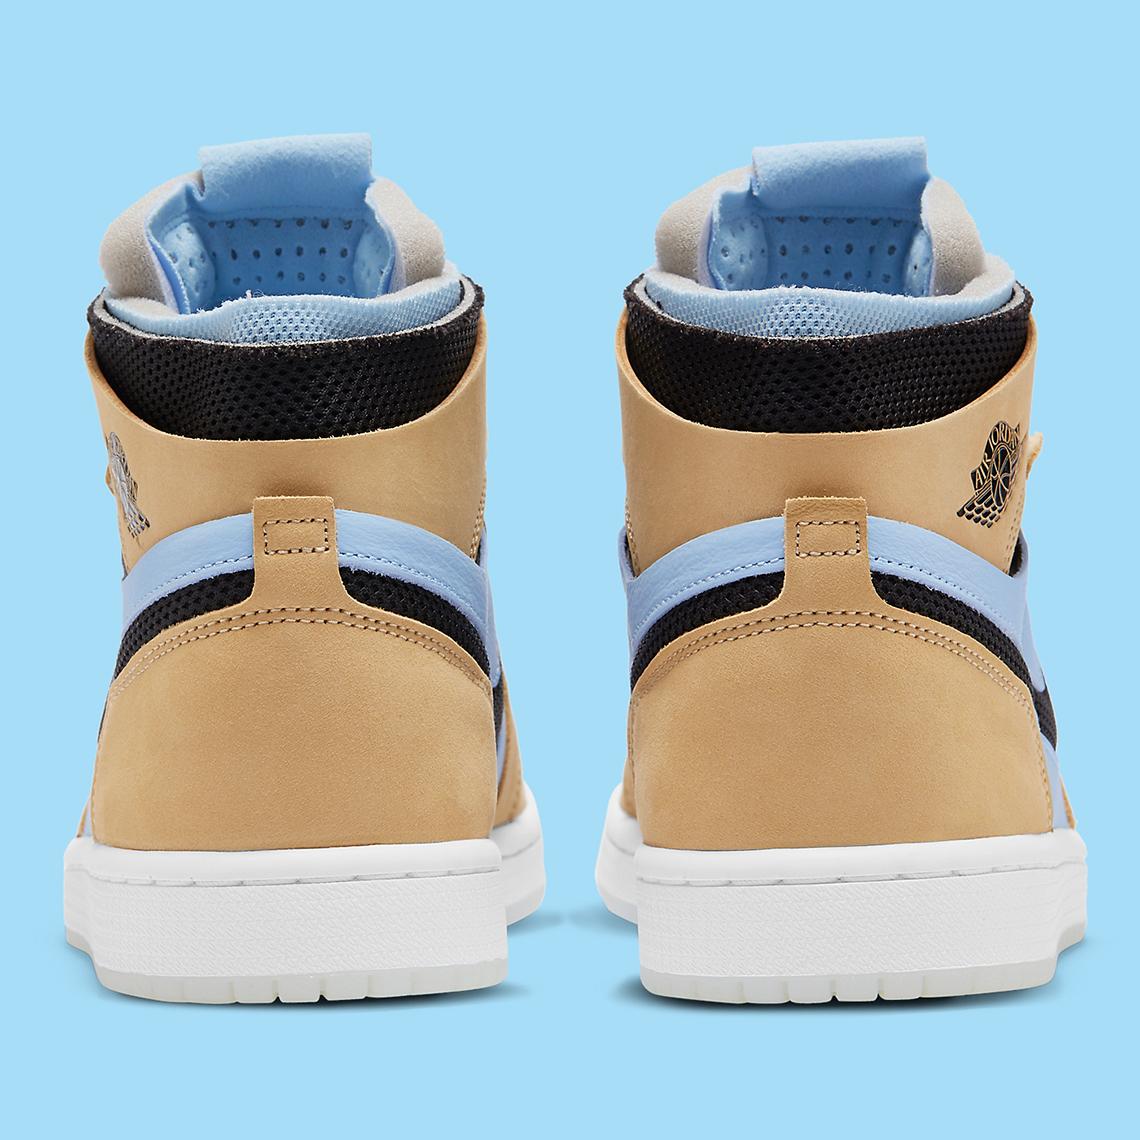 Air Jordan 1 Zoom Comfort WMNS ''Psychic Blue'' - CT0979-400